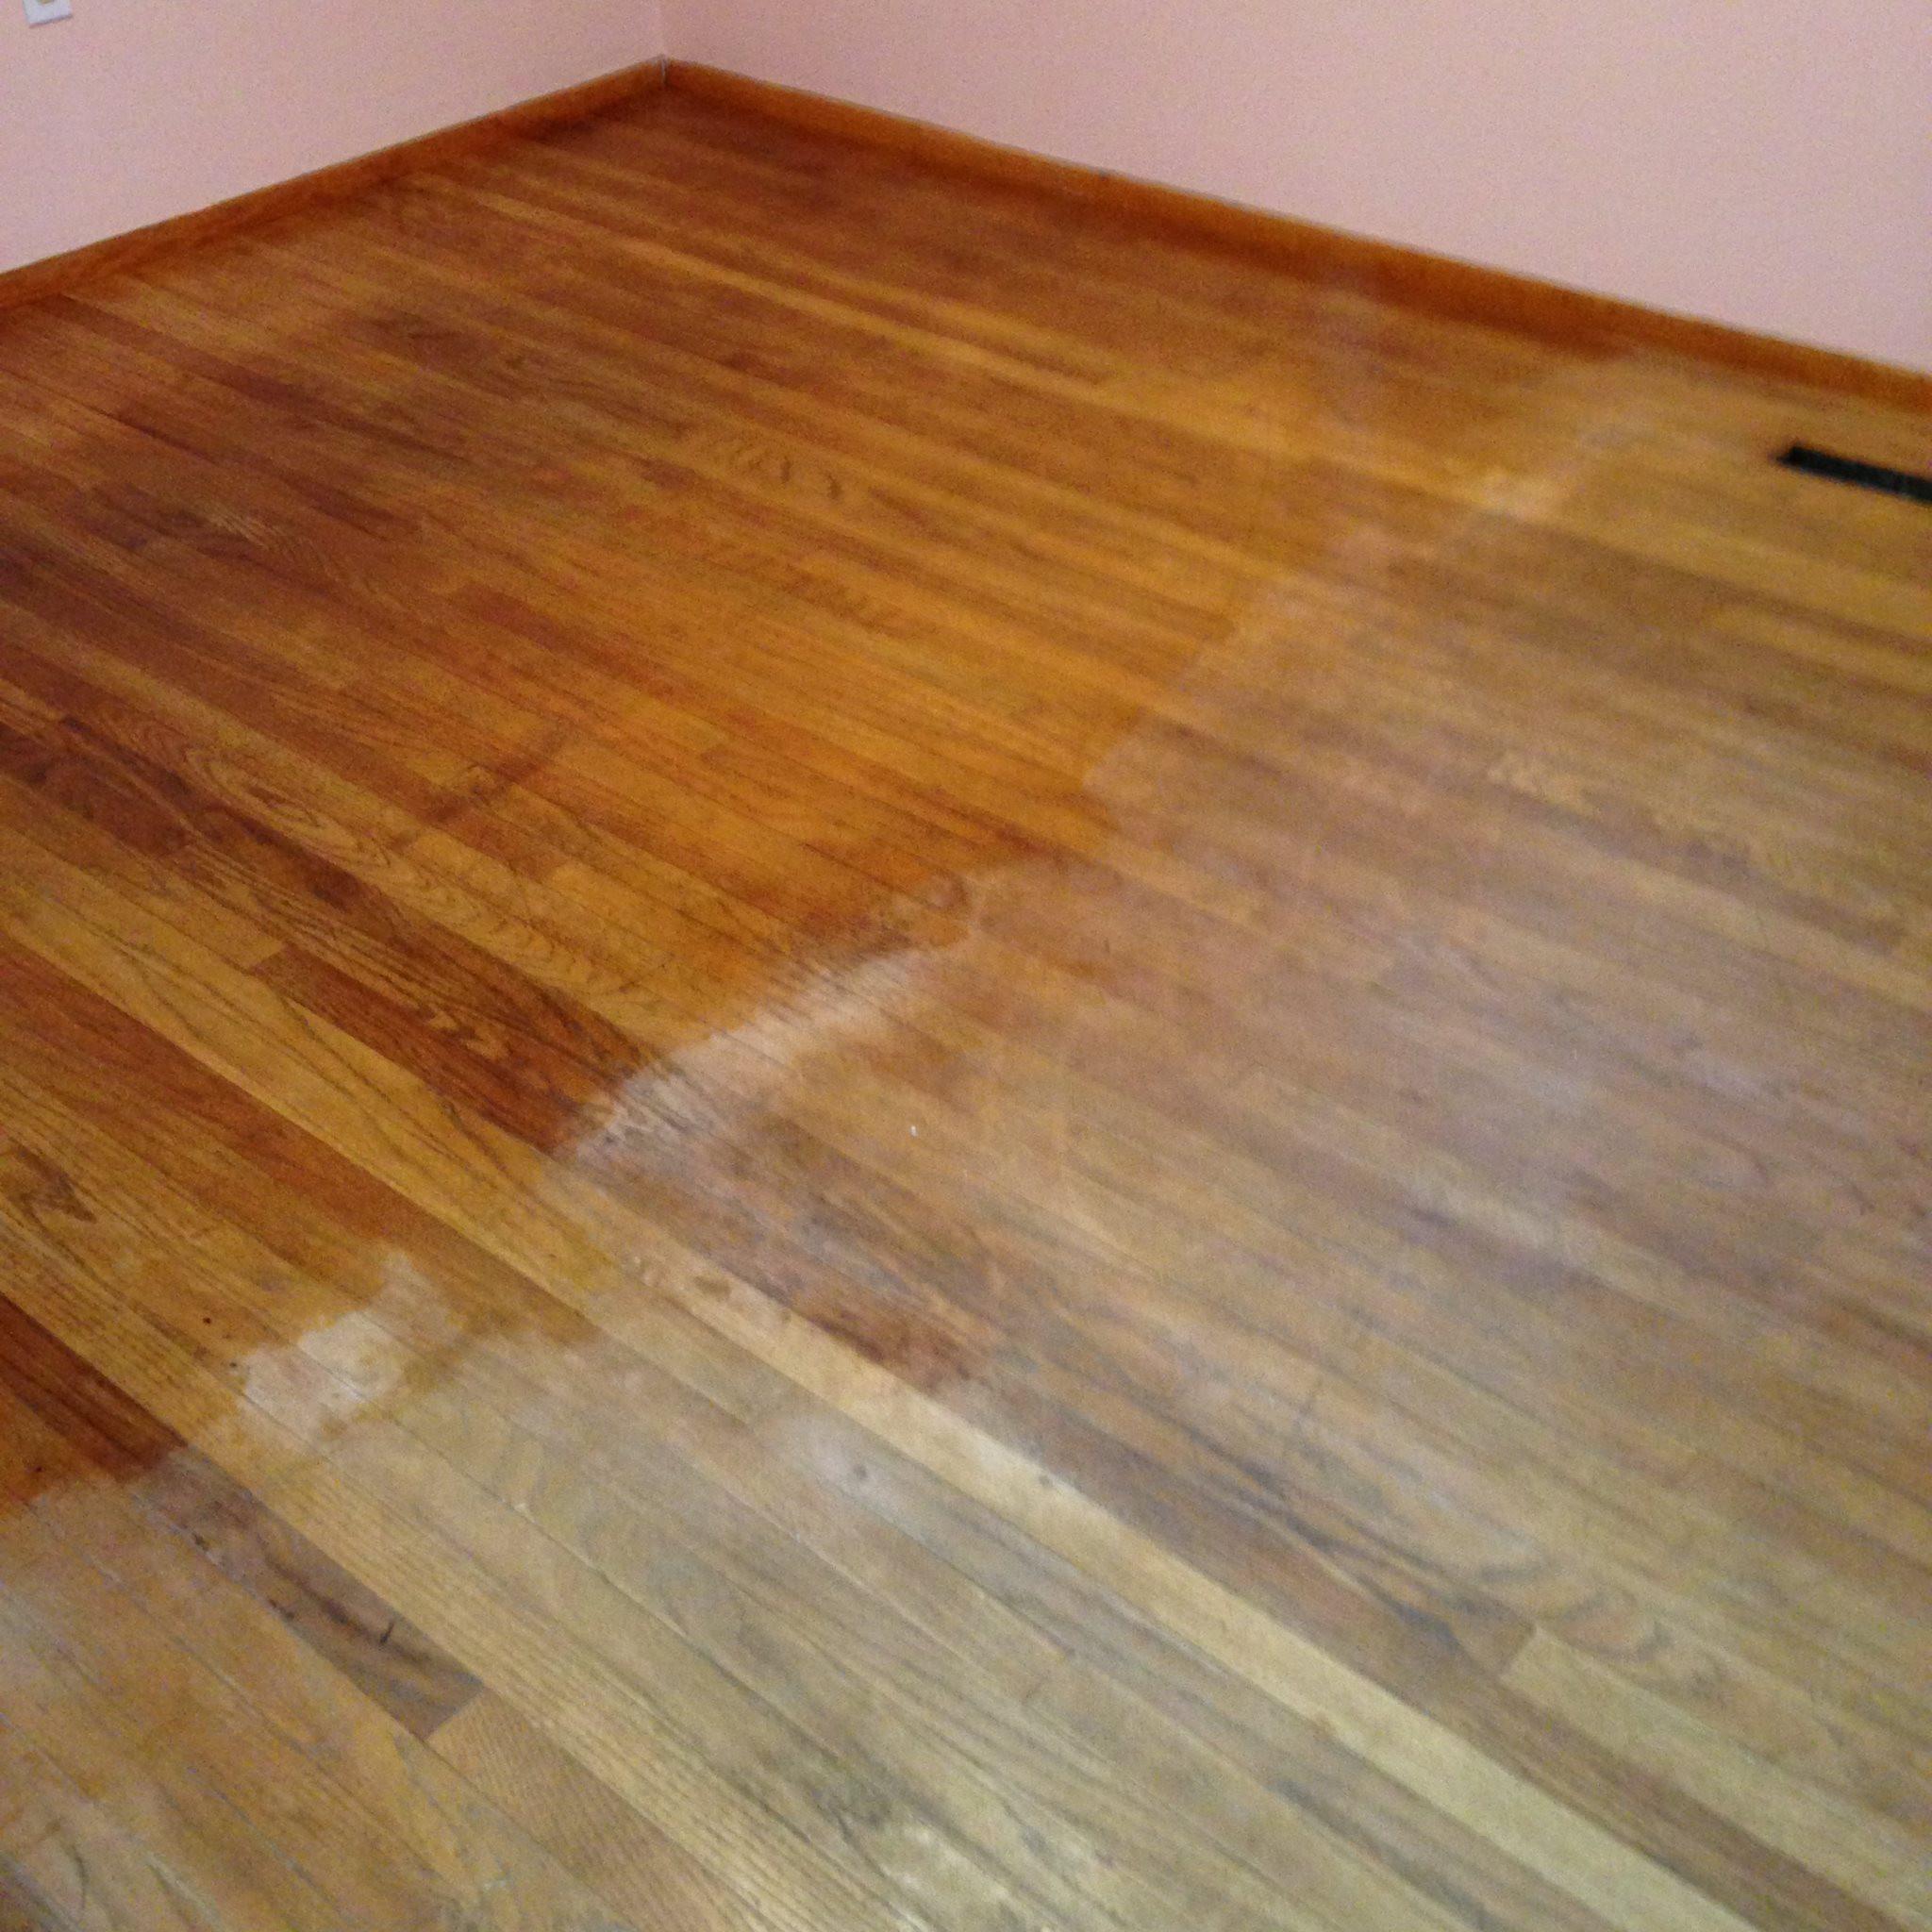 hardwood floor wax filler of 15 wood floor hacks every homeowner needs to know for wood floor hacks 15